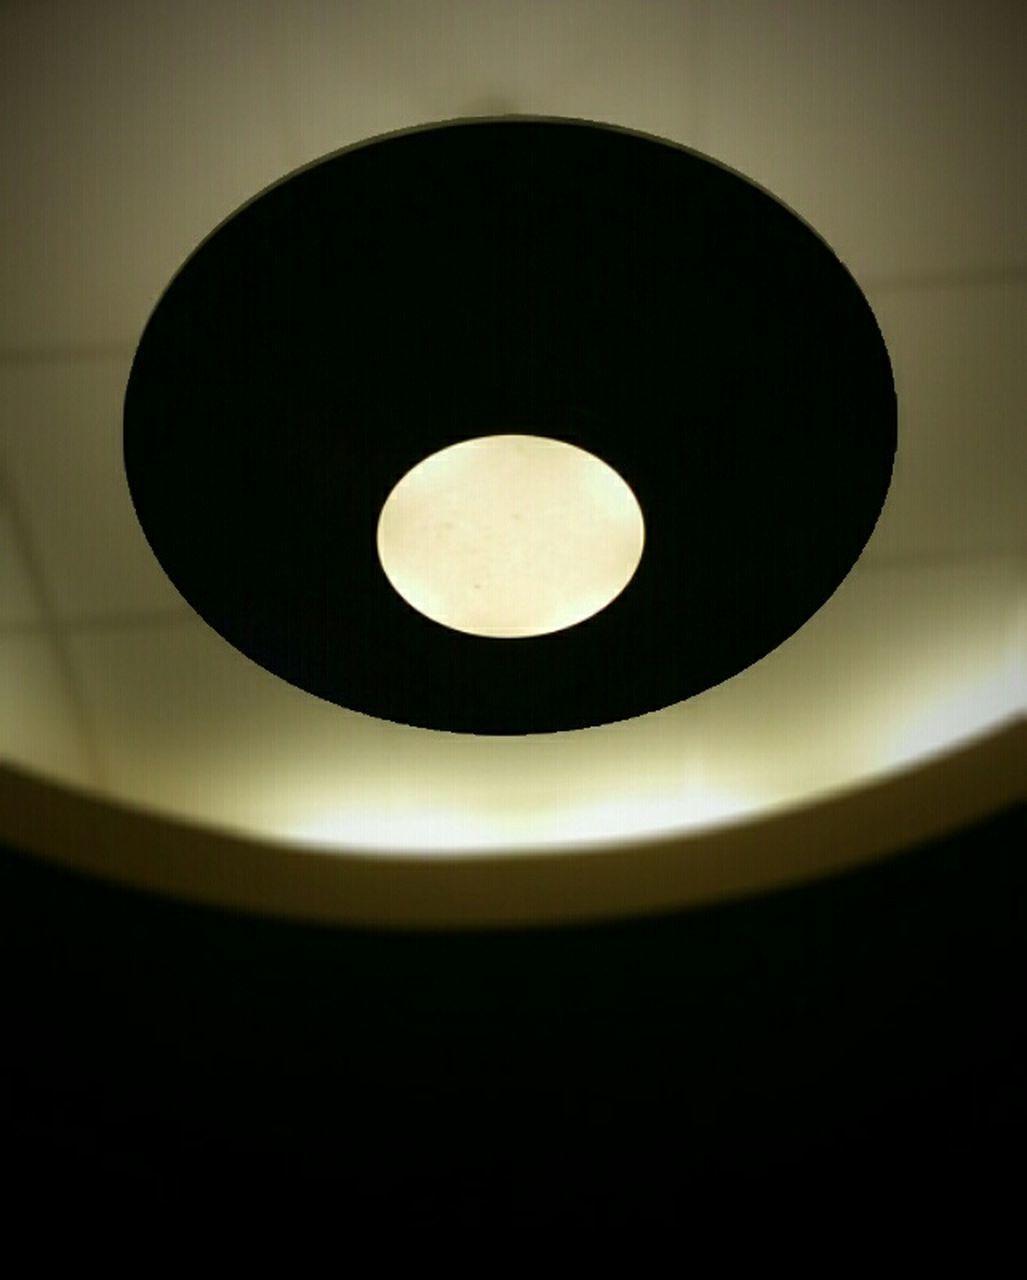 indoors, illuminated, no people, close-up, modern, black background, technology, astronomy